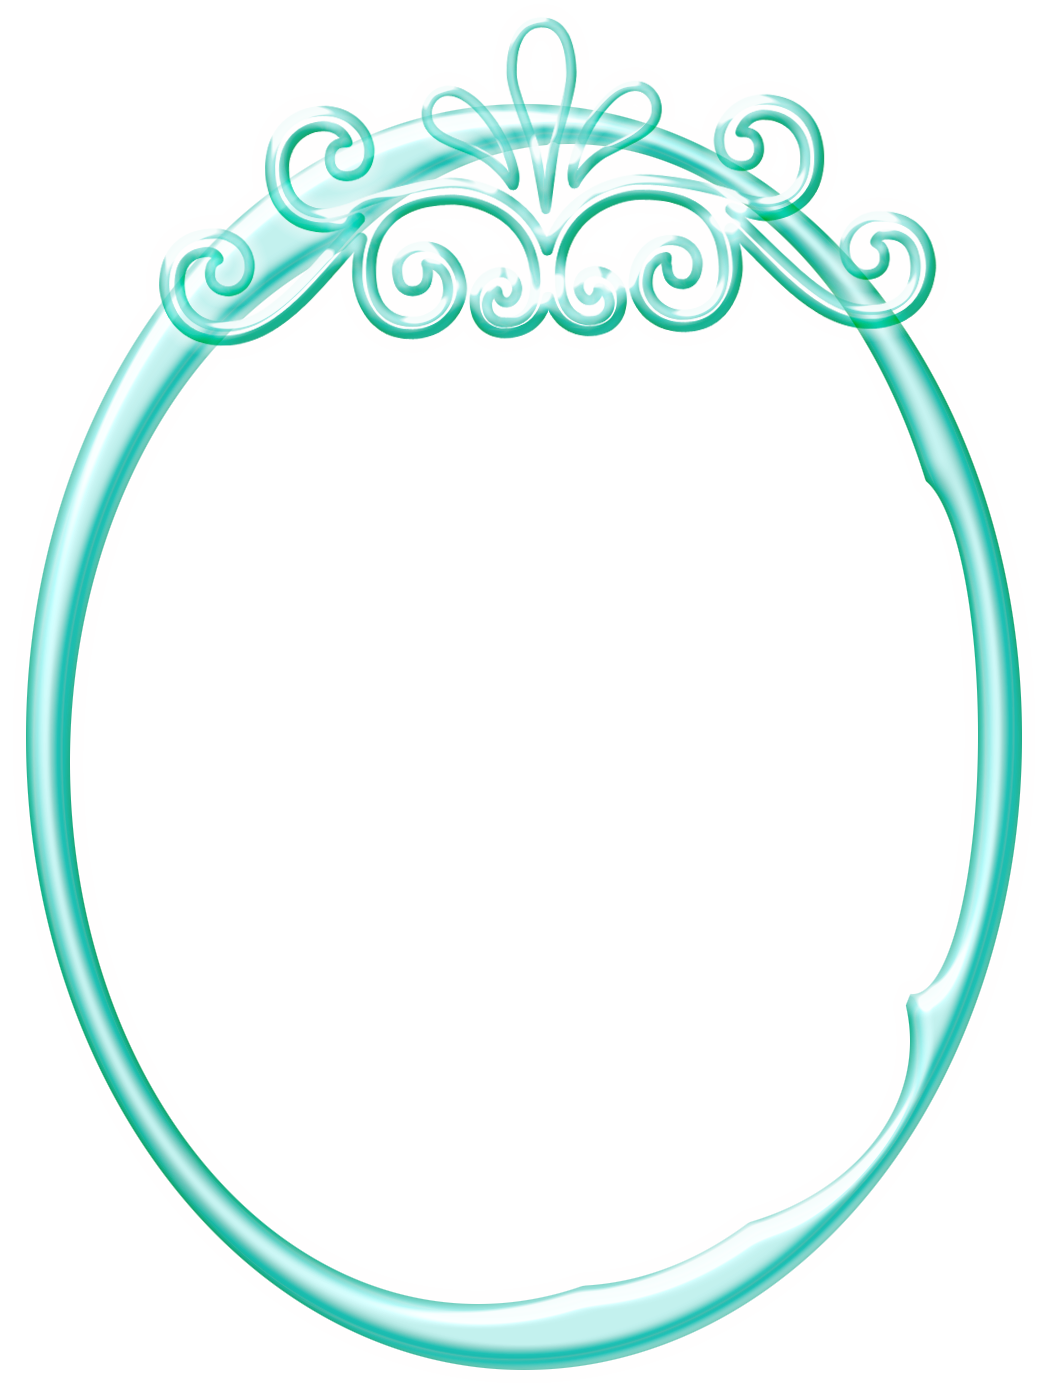 Frame moldura azul png. Clipart frames teal